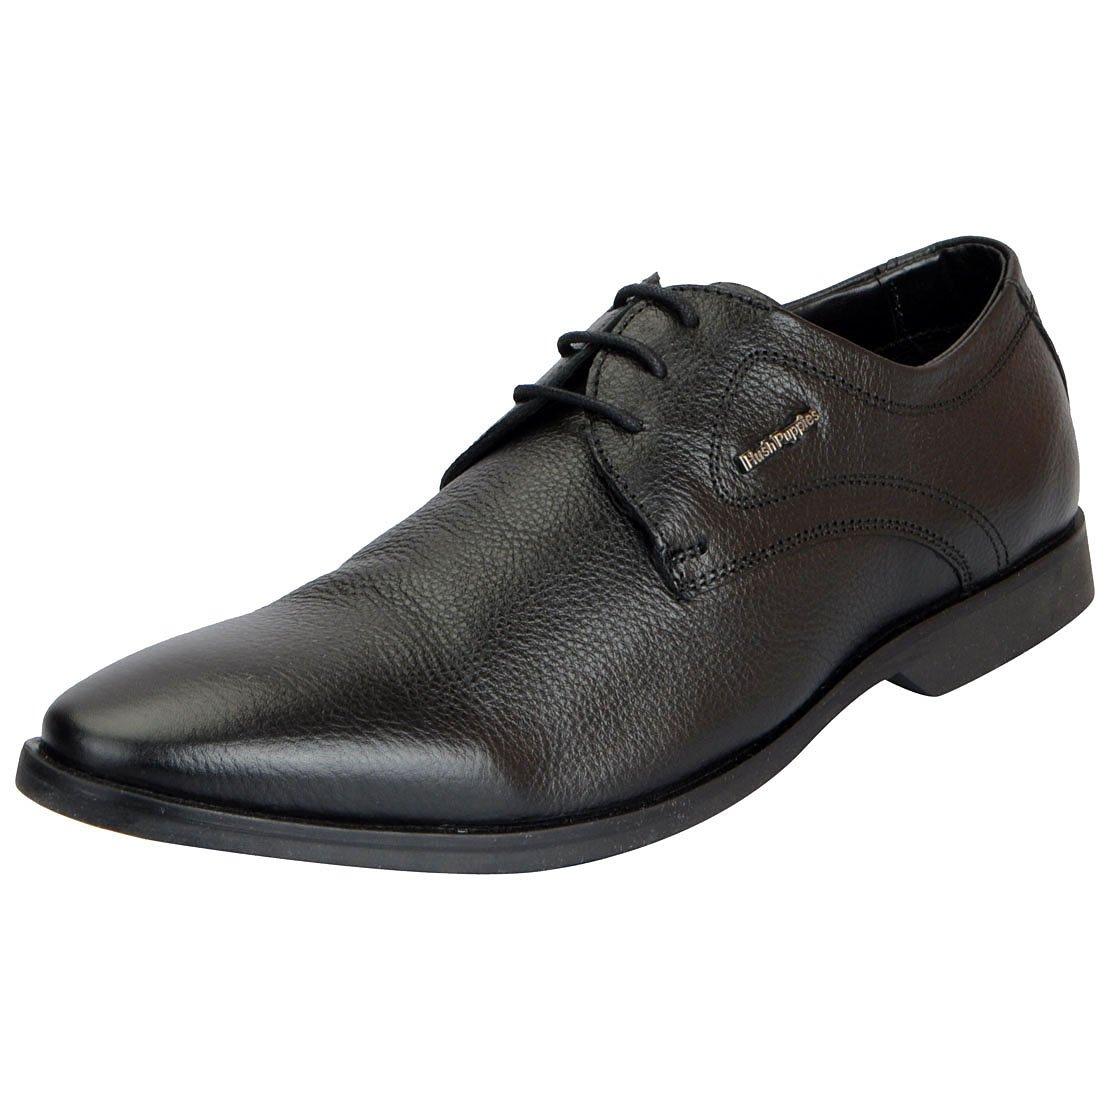 hush puppies hpo2 flex black formal shoes